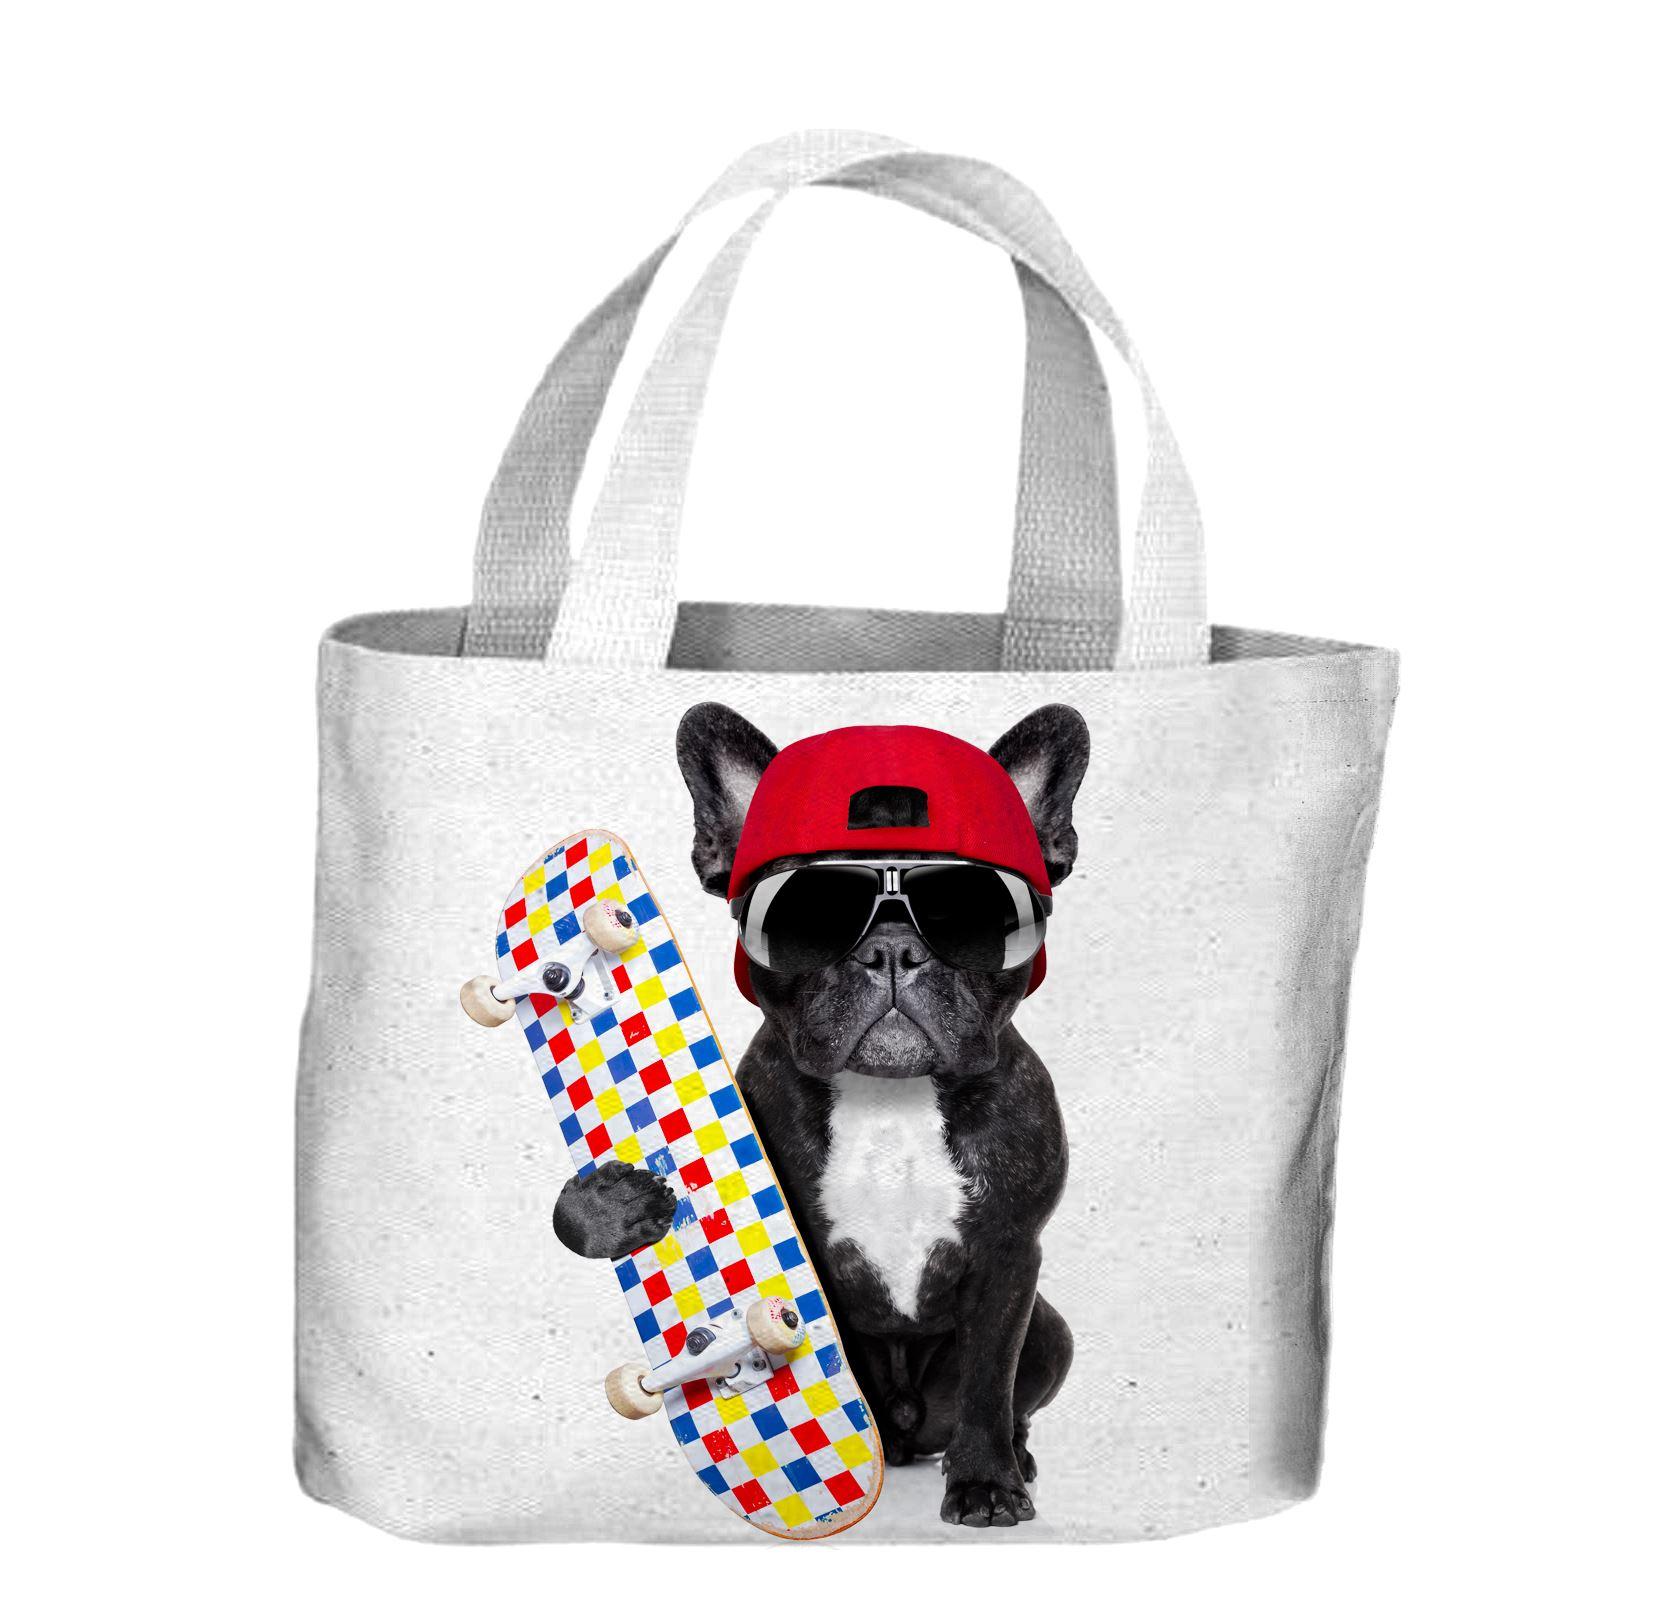 French Bulldog Skateboarder Tote Shopping Bag For Life 5056114013080 ... 578645de00